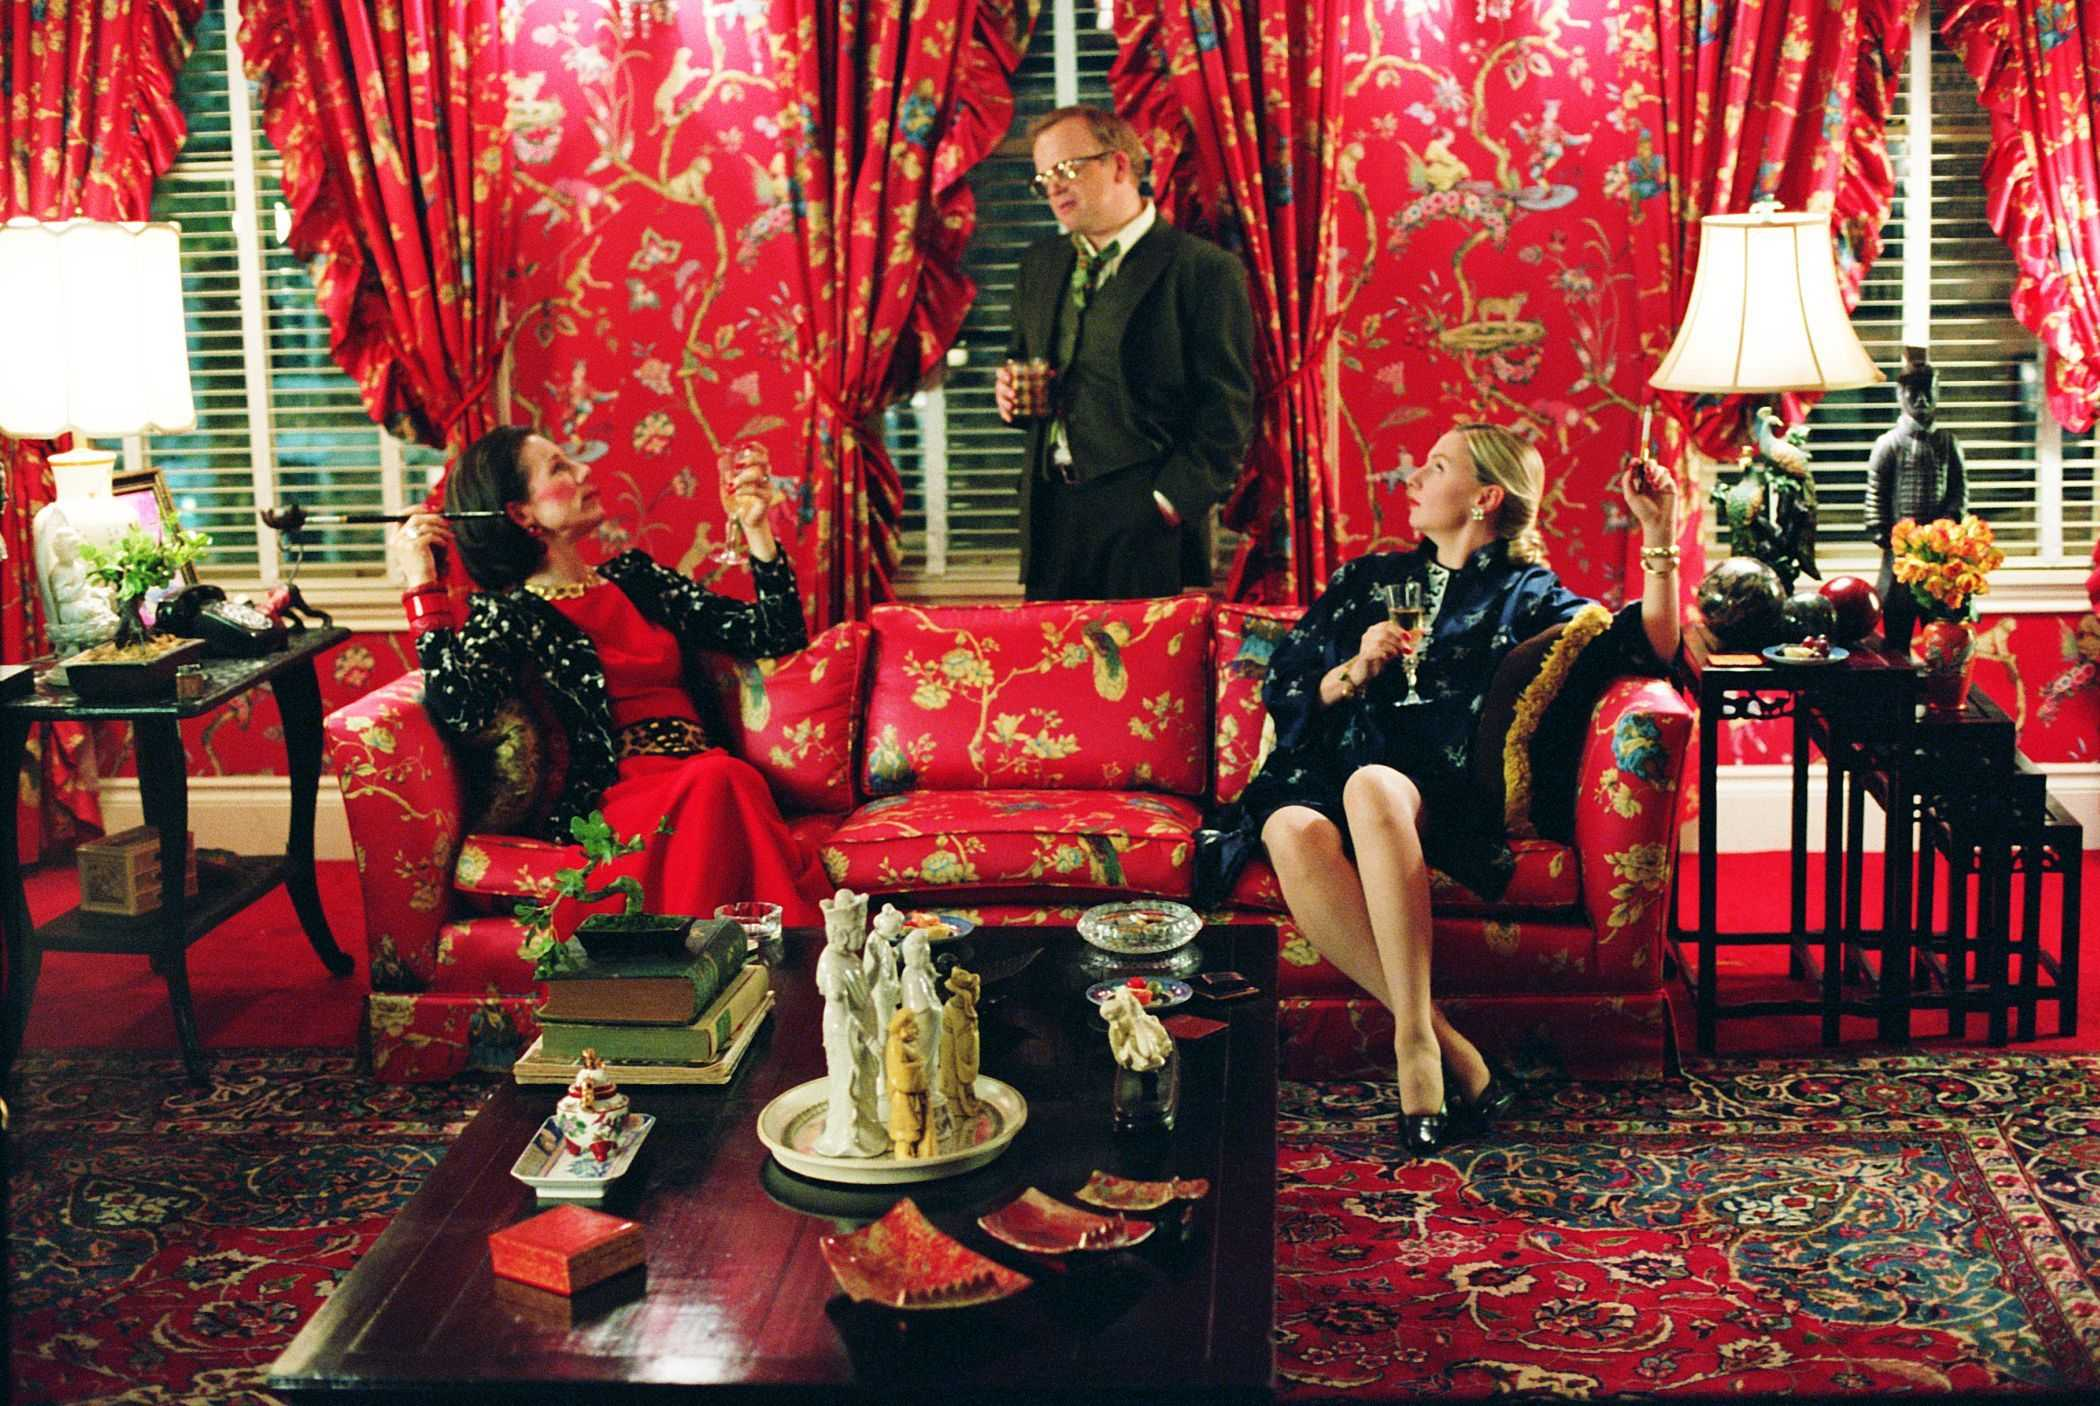 Capote's flamboyant tastes are reflected in his sumptuous Manhattan apartment.